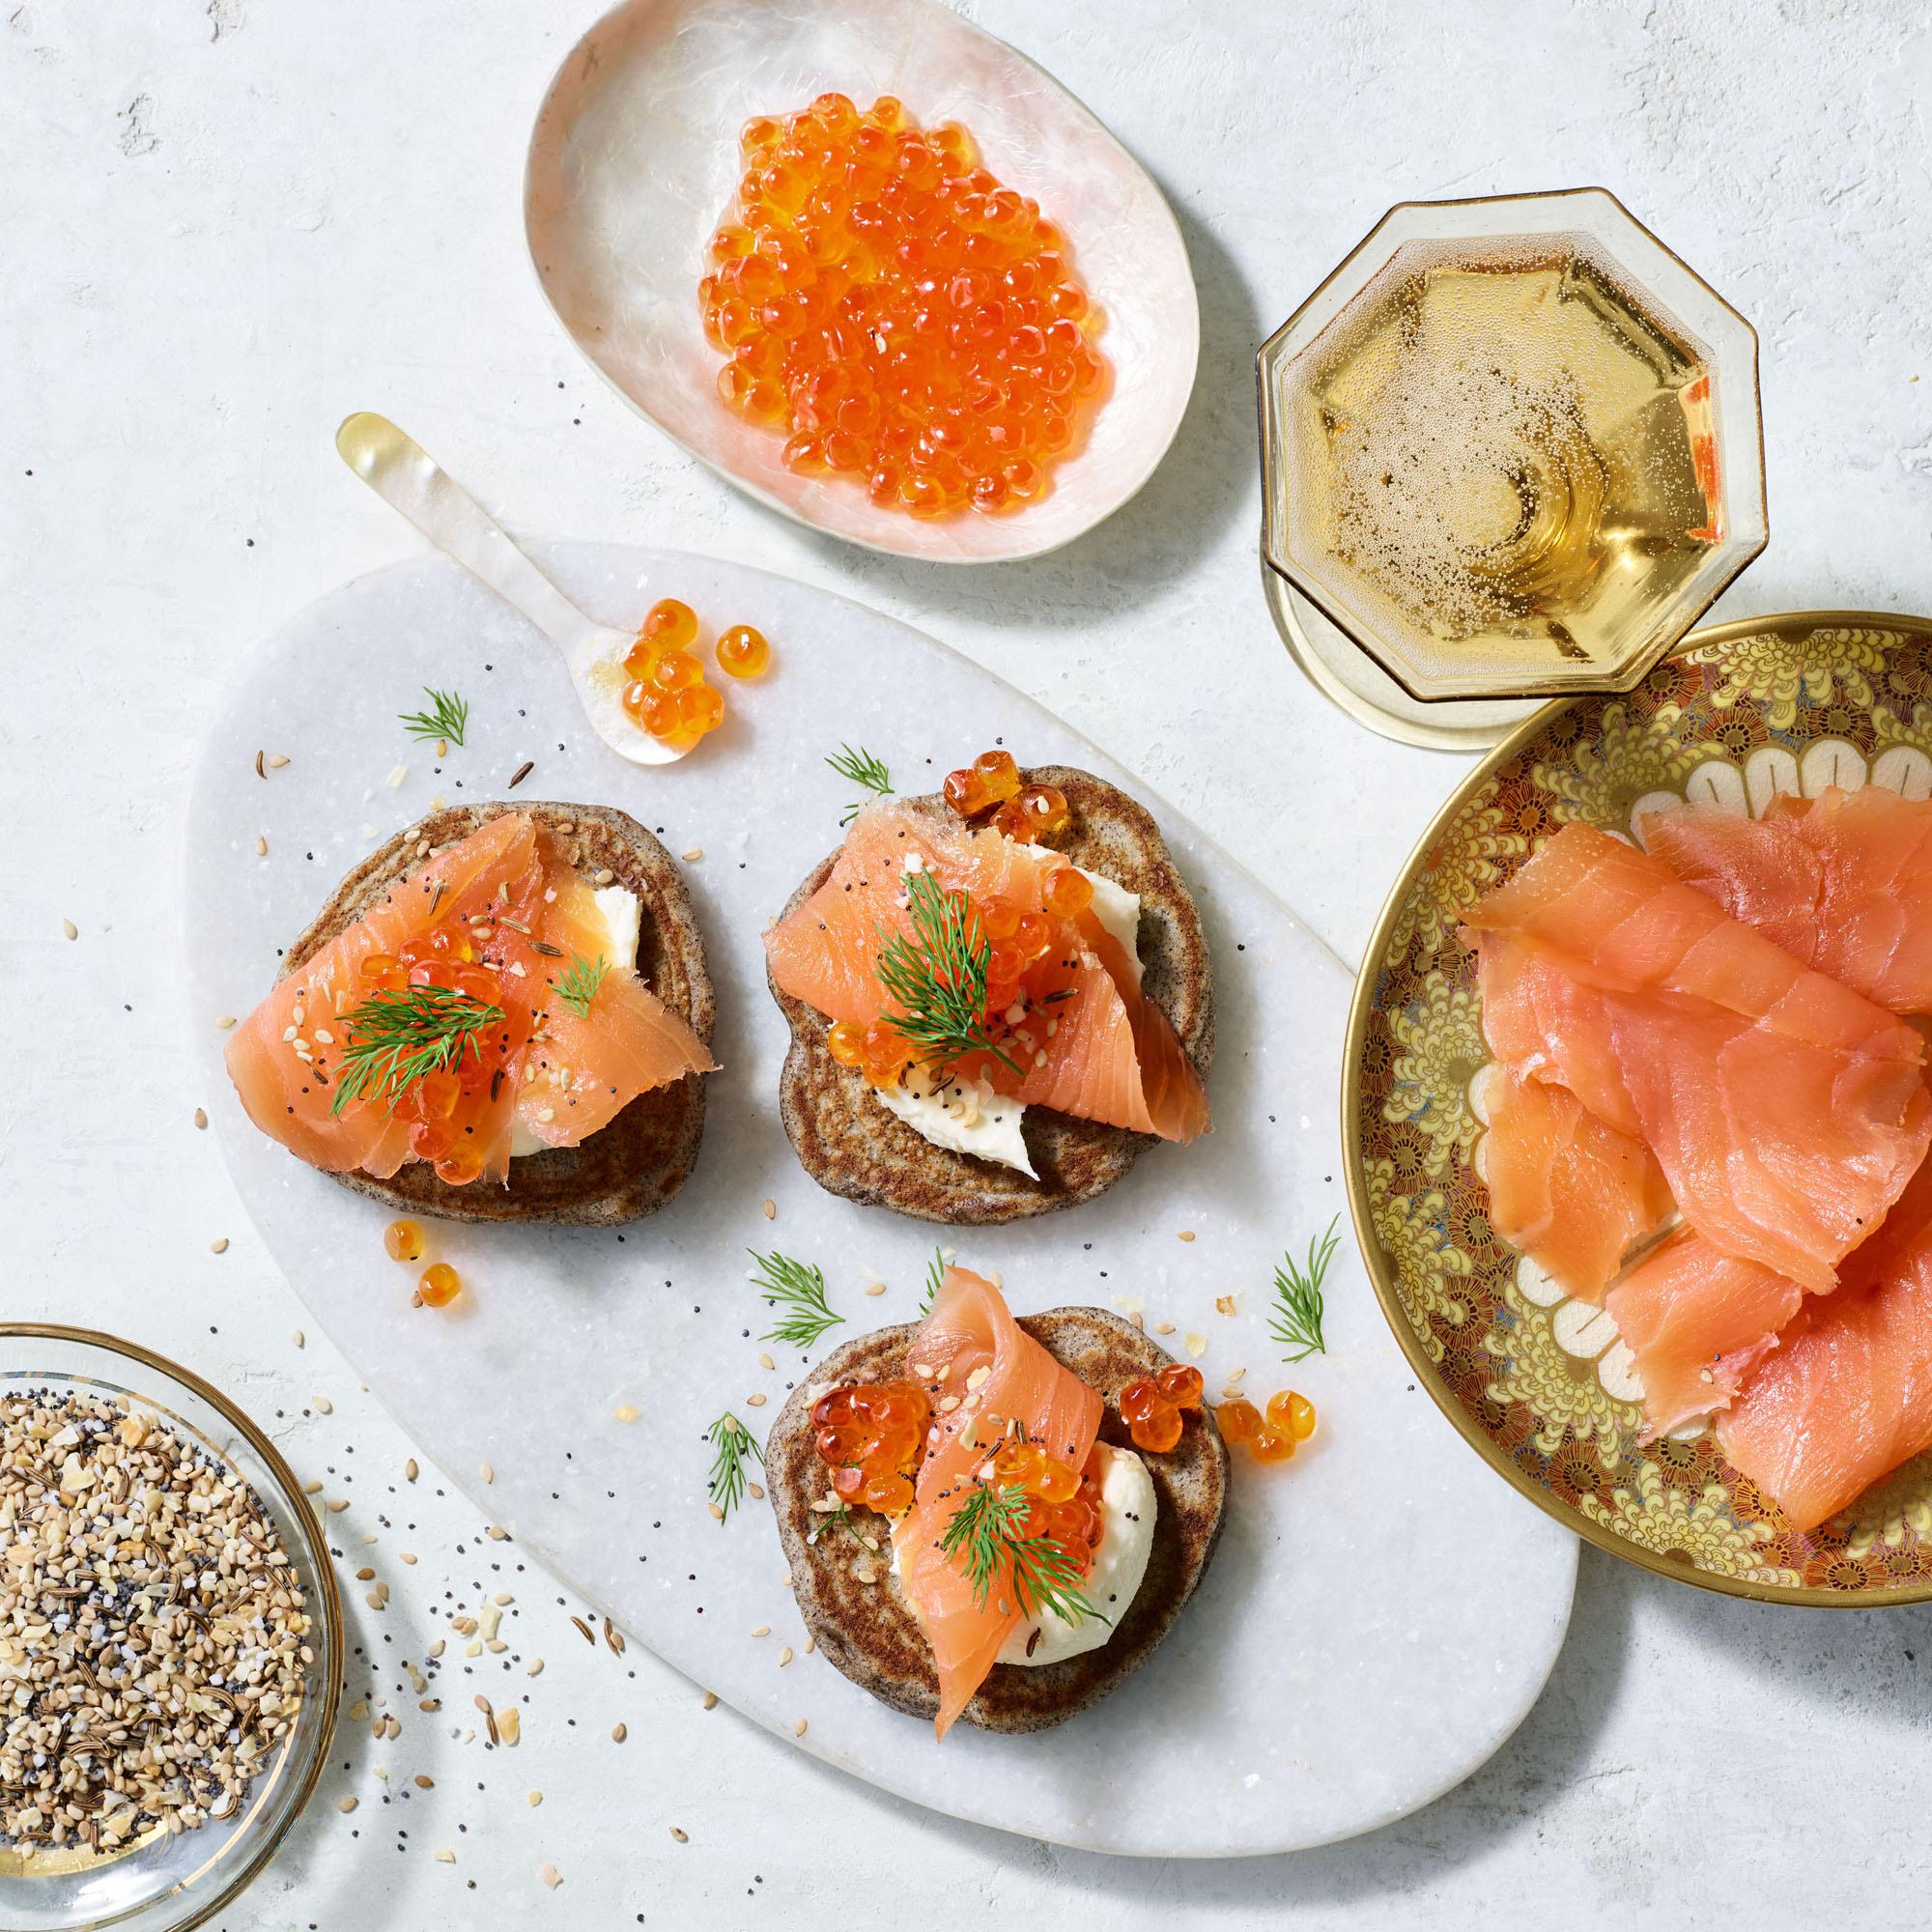 everything blini with smoked salmon